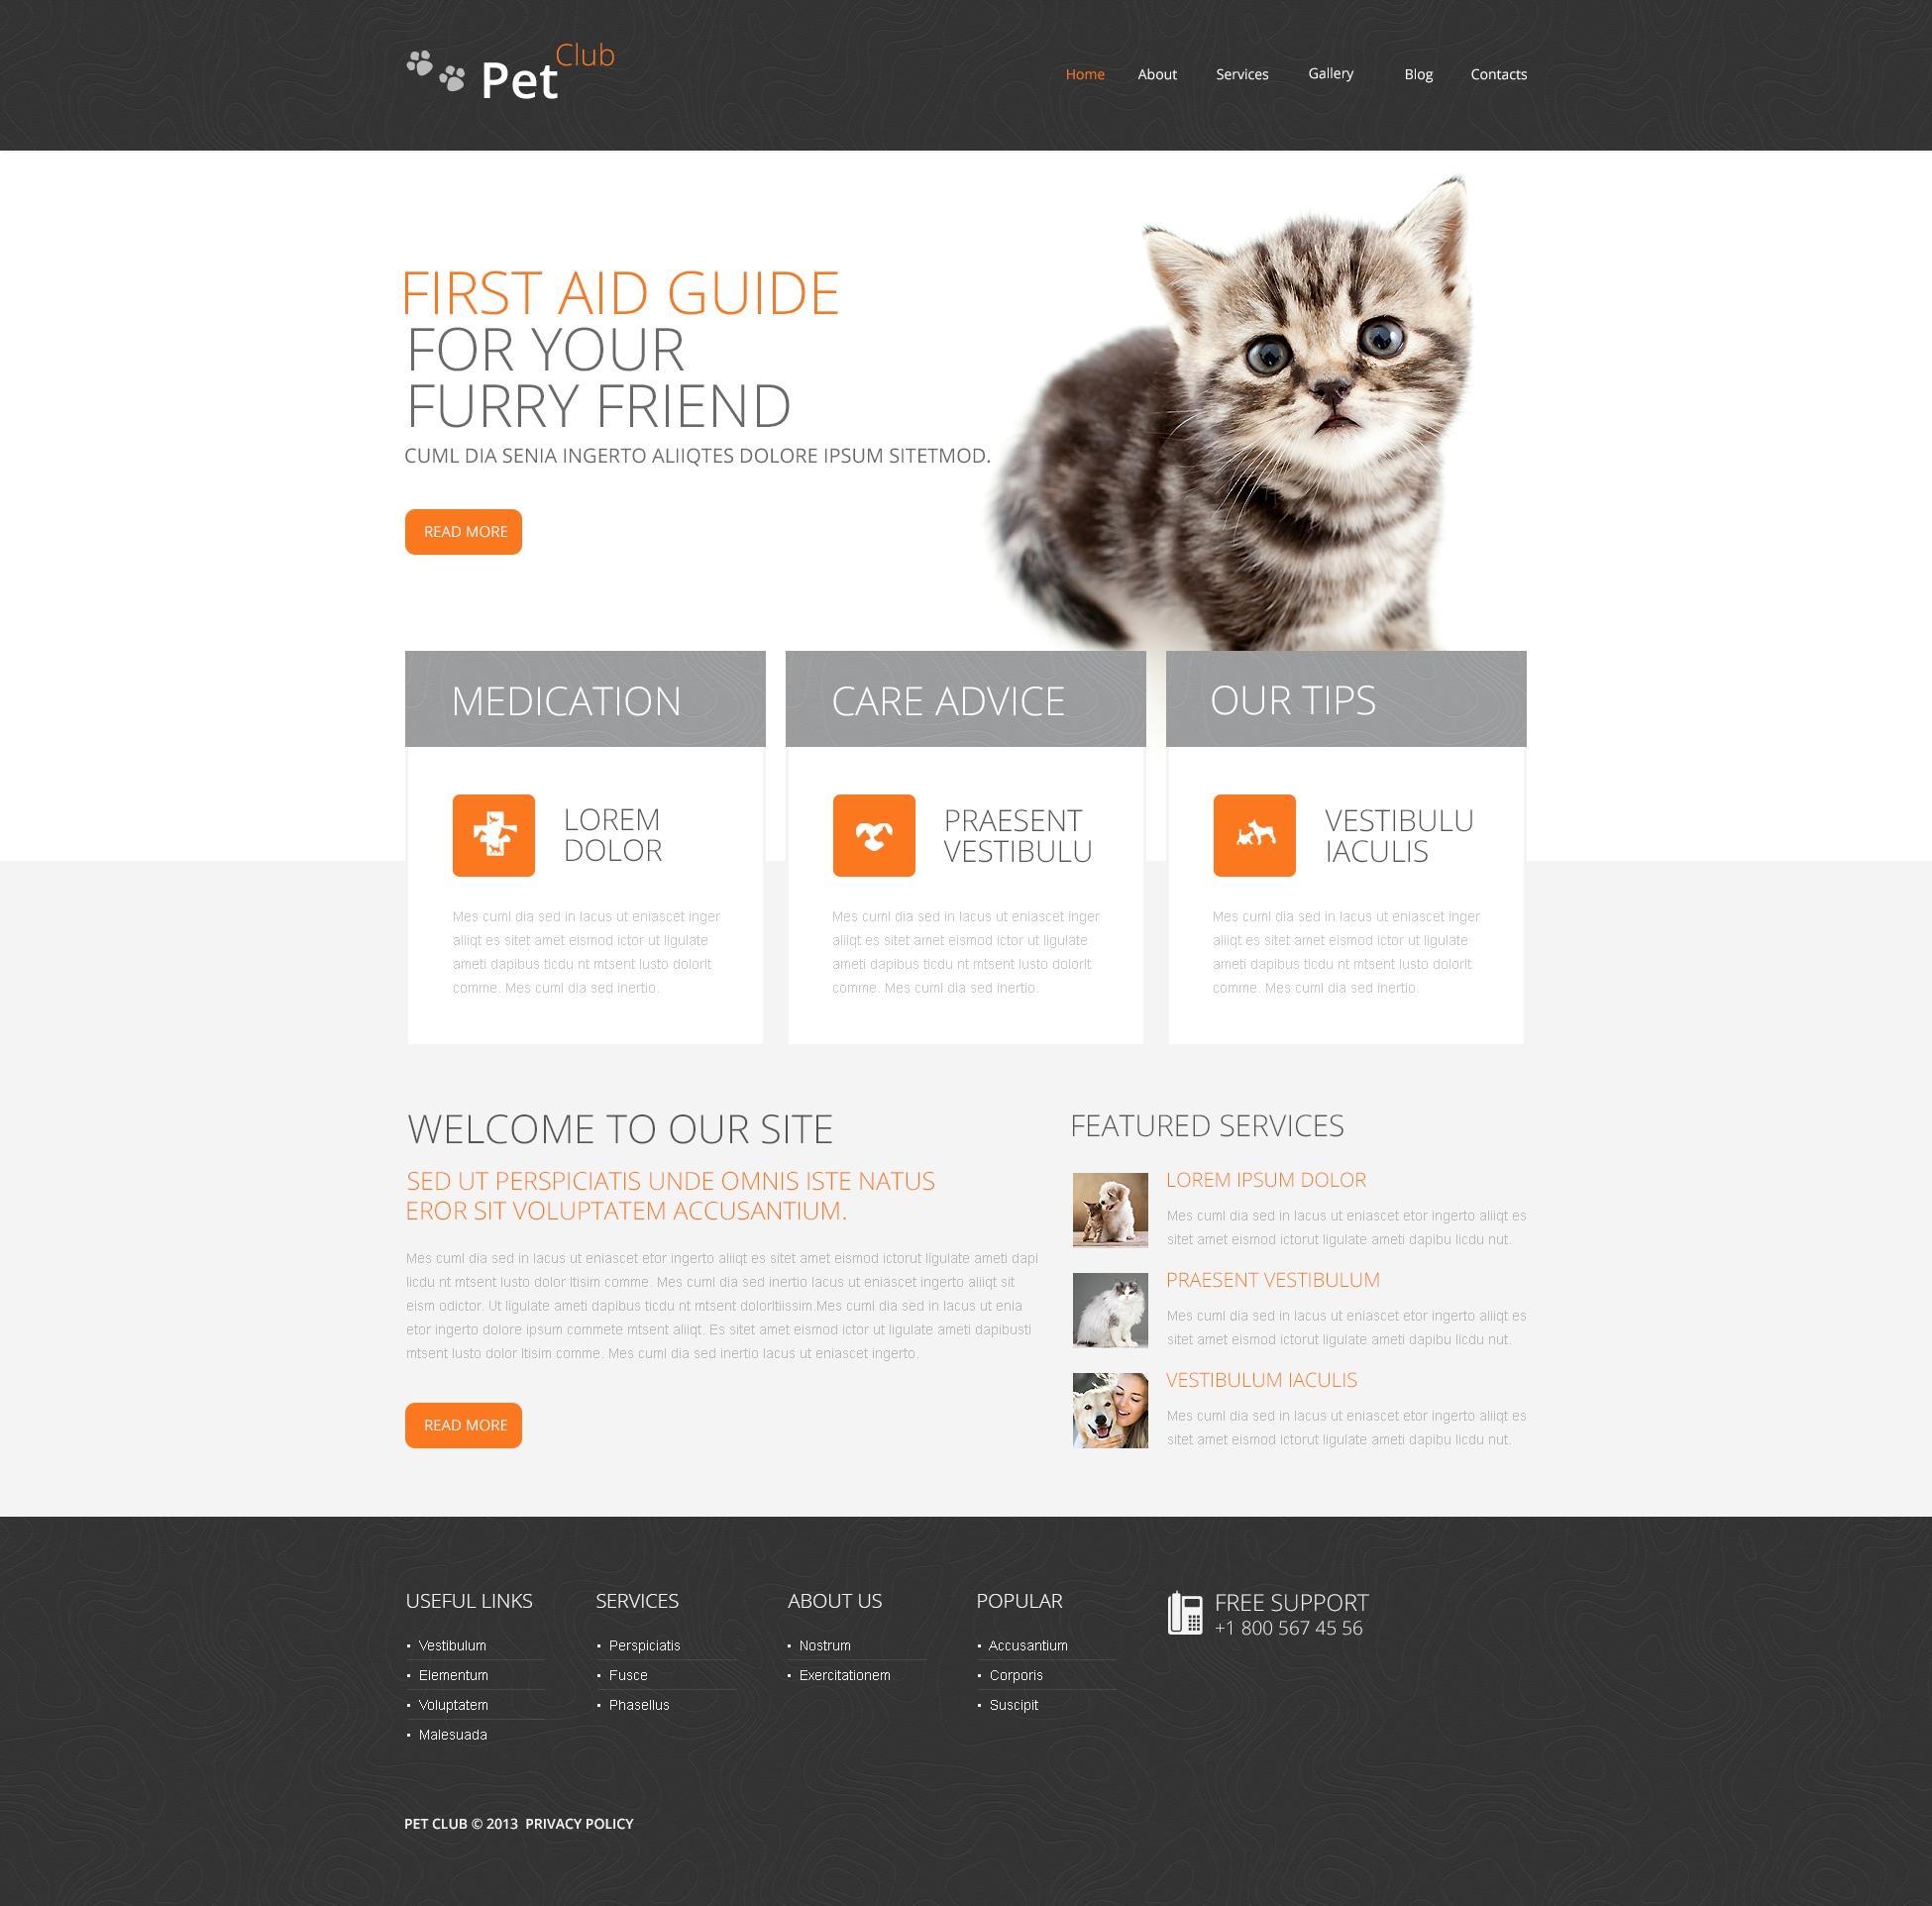 Pet Club Drupal Template - screenshot